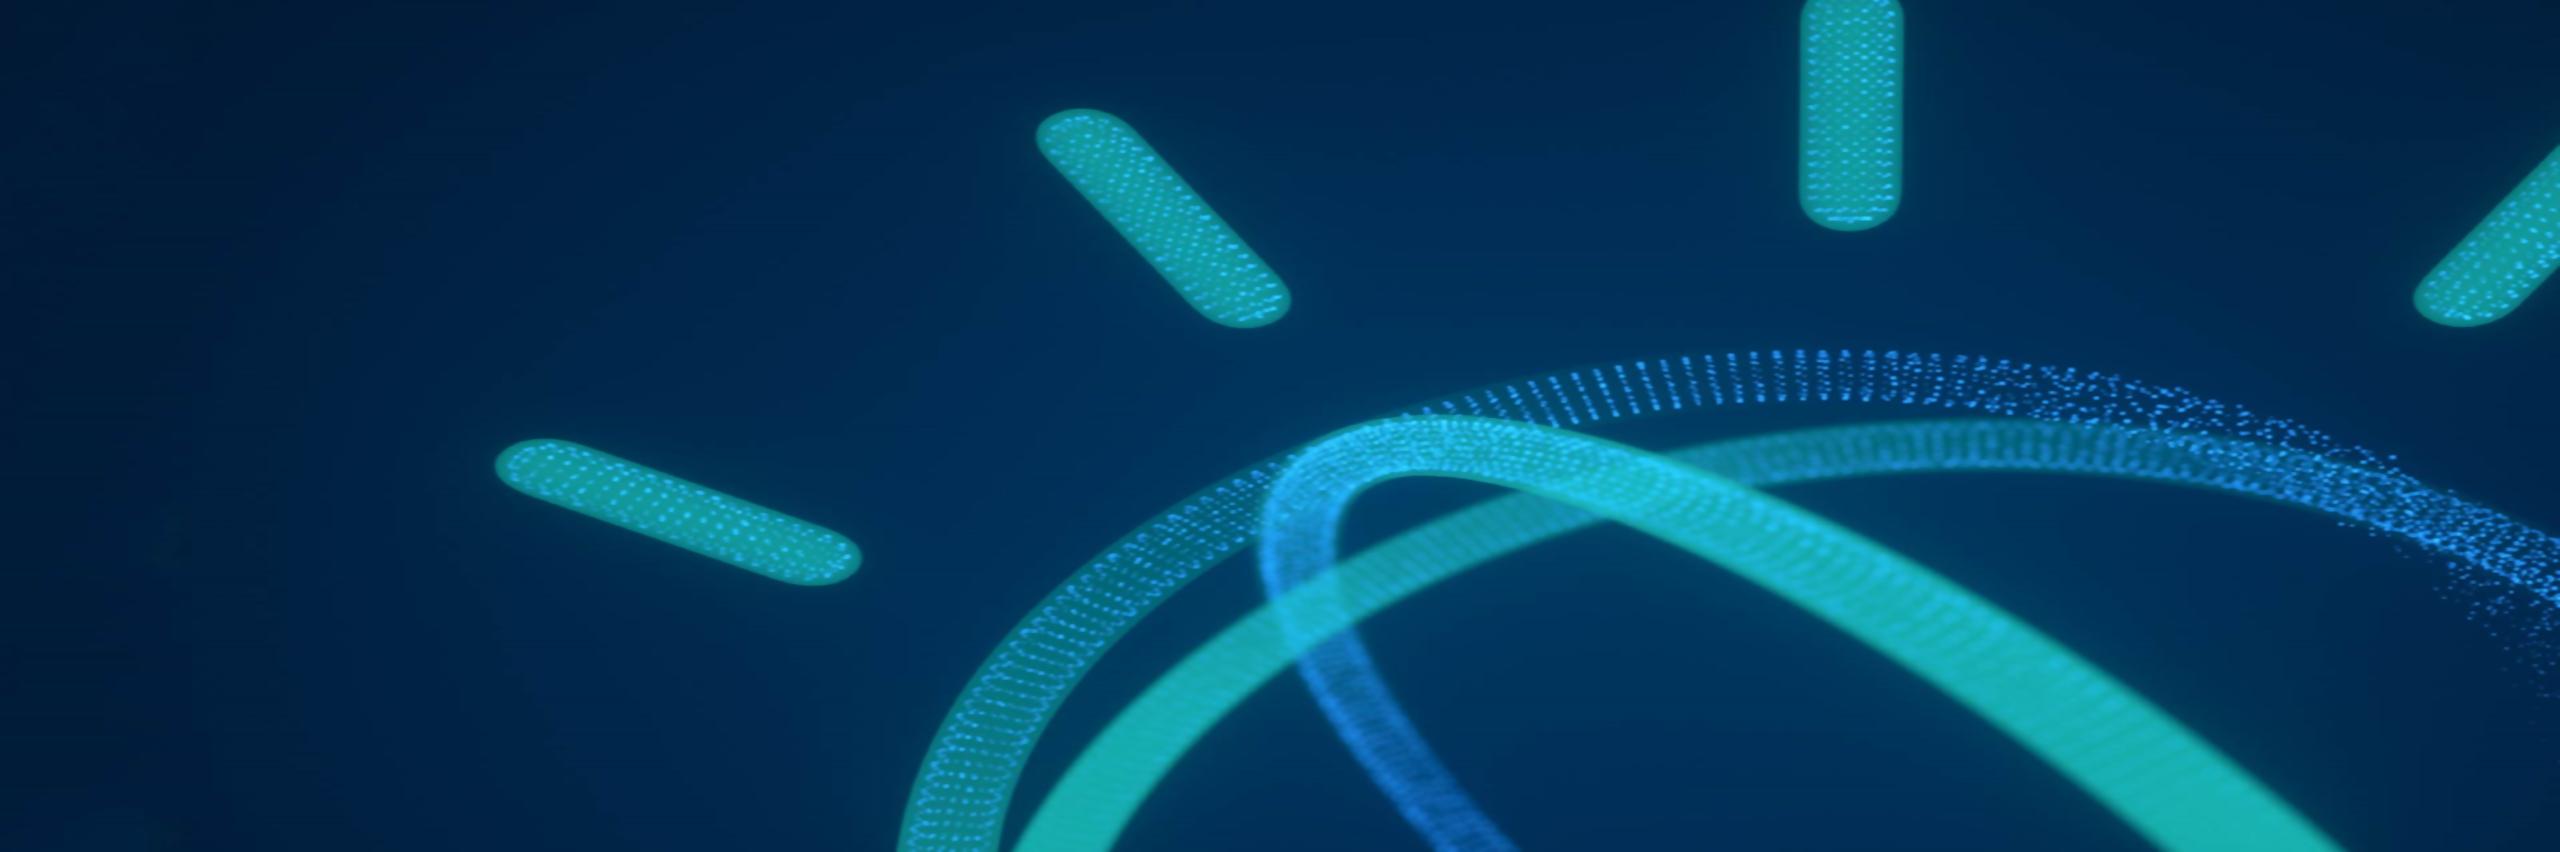 World of Watson - Redefining Development